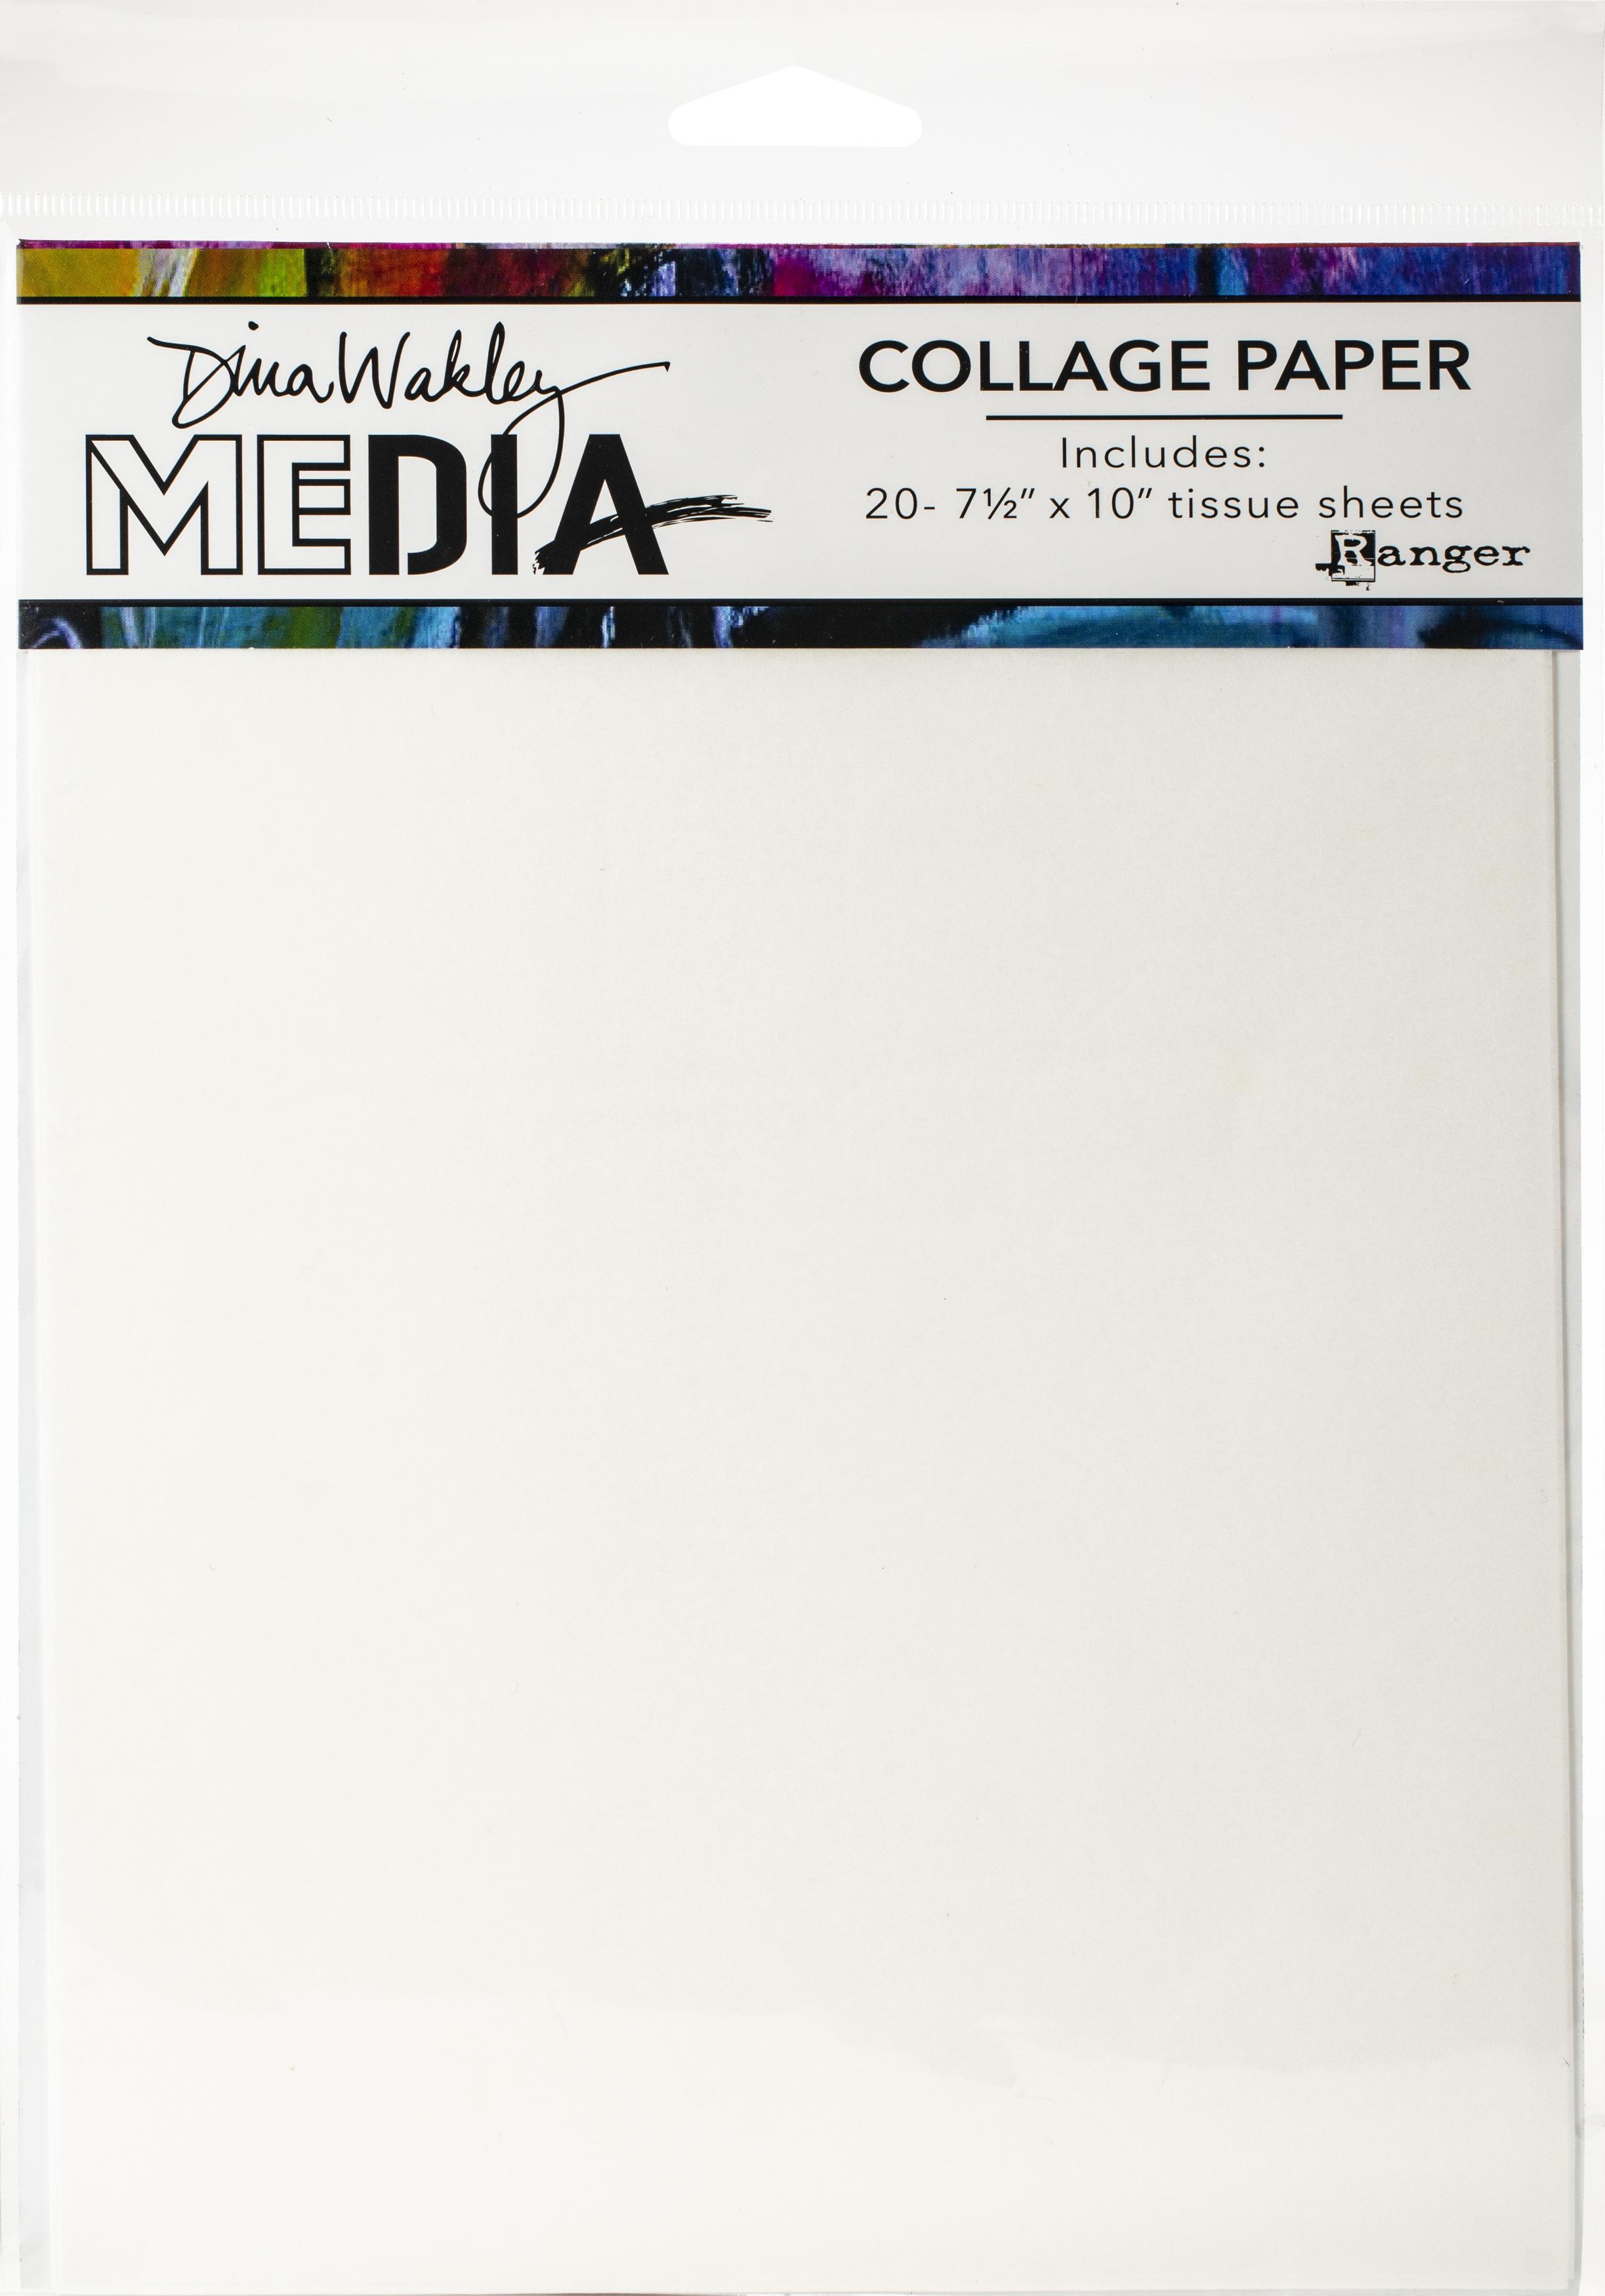 Dina Wakley Media Collage Tissue Paper 7.5X10 20/Pkg-Plain